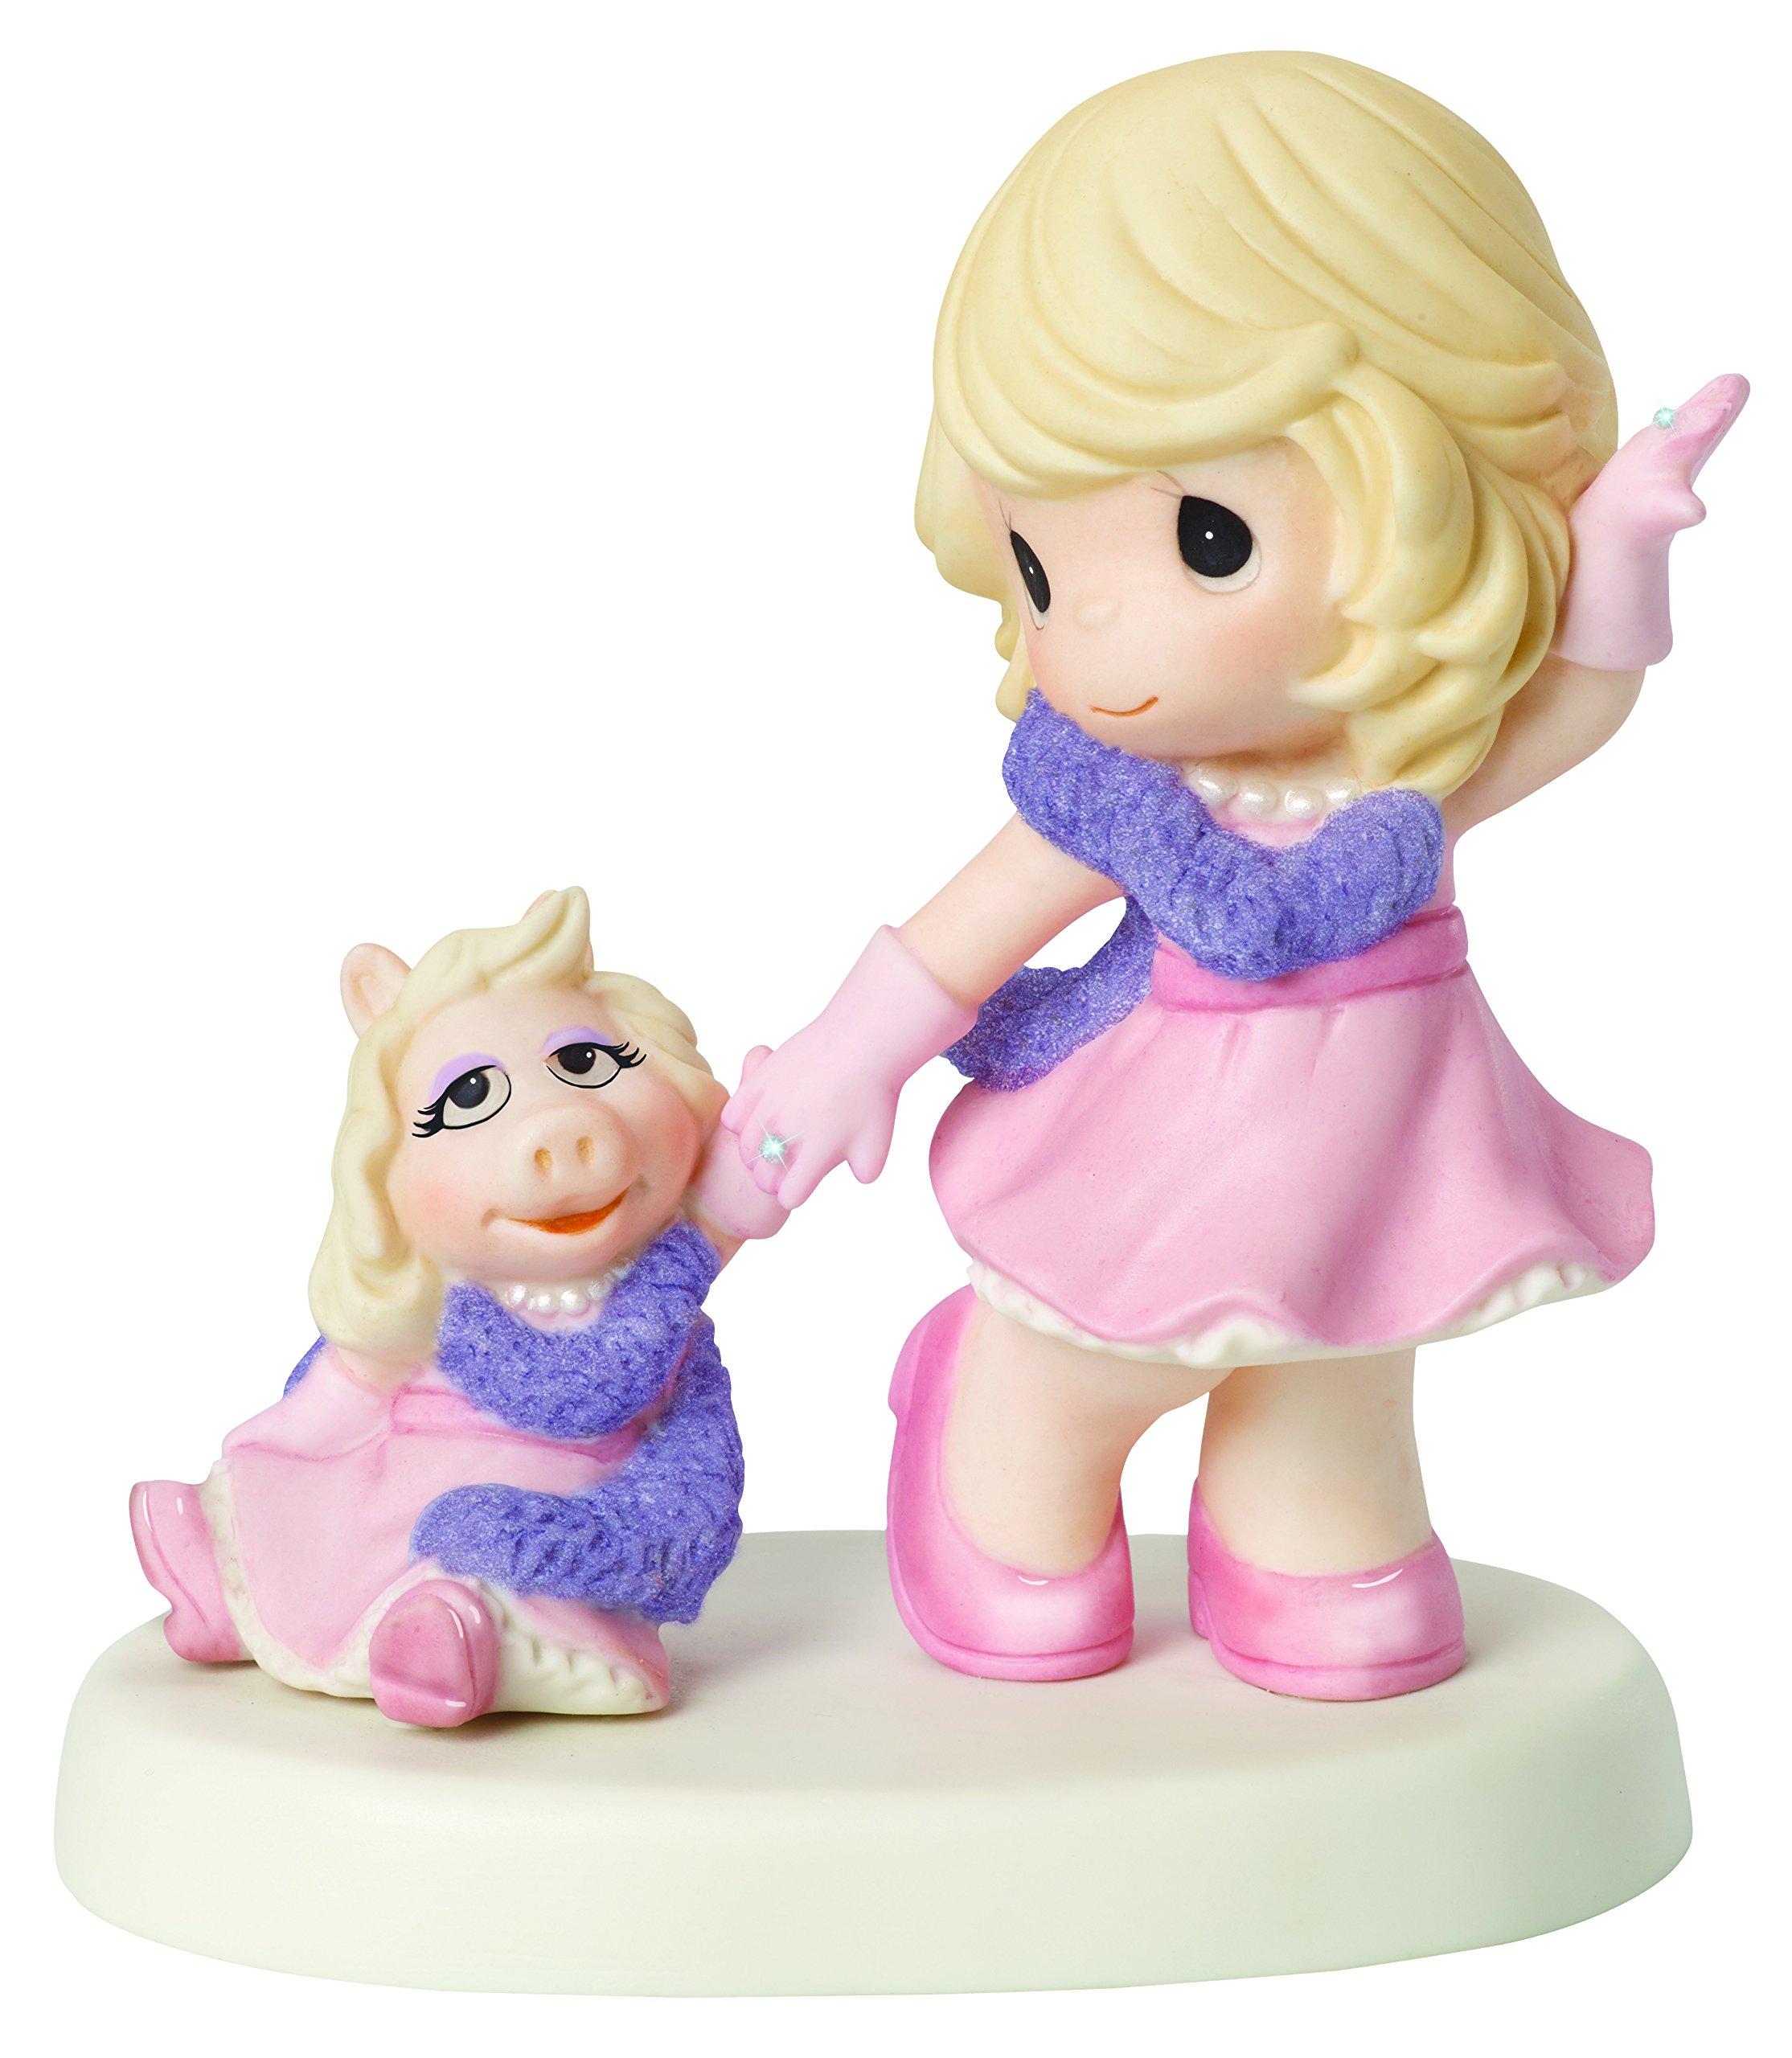 Precious Moments, Disney The Muppets, Our Friendship Is Fabulous Bisque Porcelain Figurine, Miss Piggy, 154014